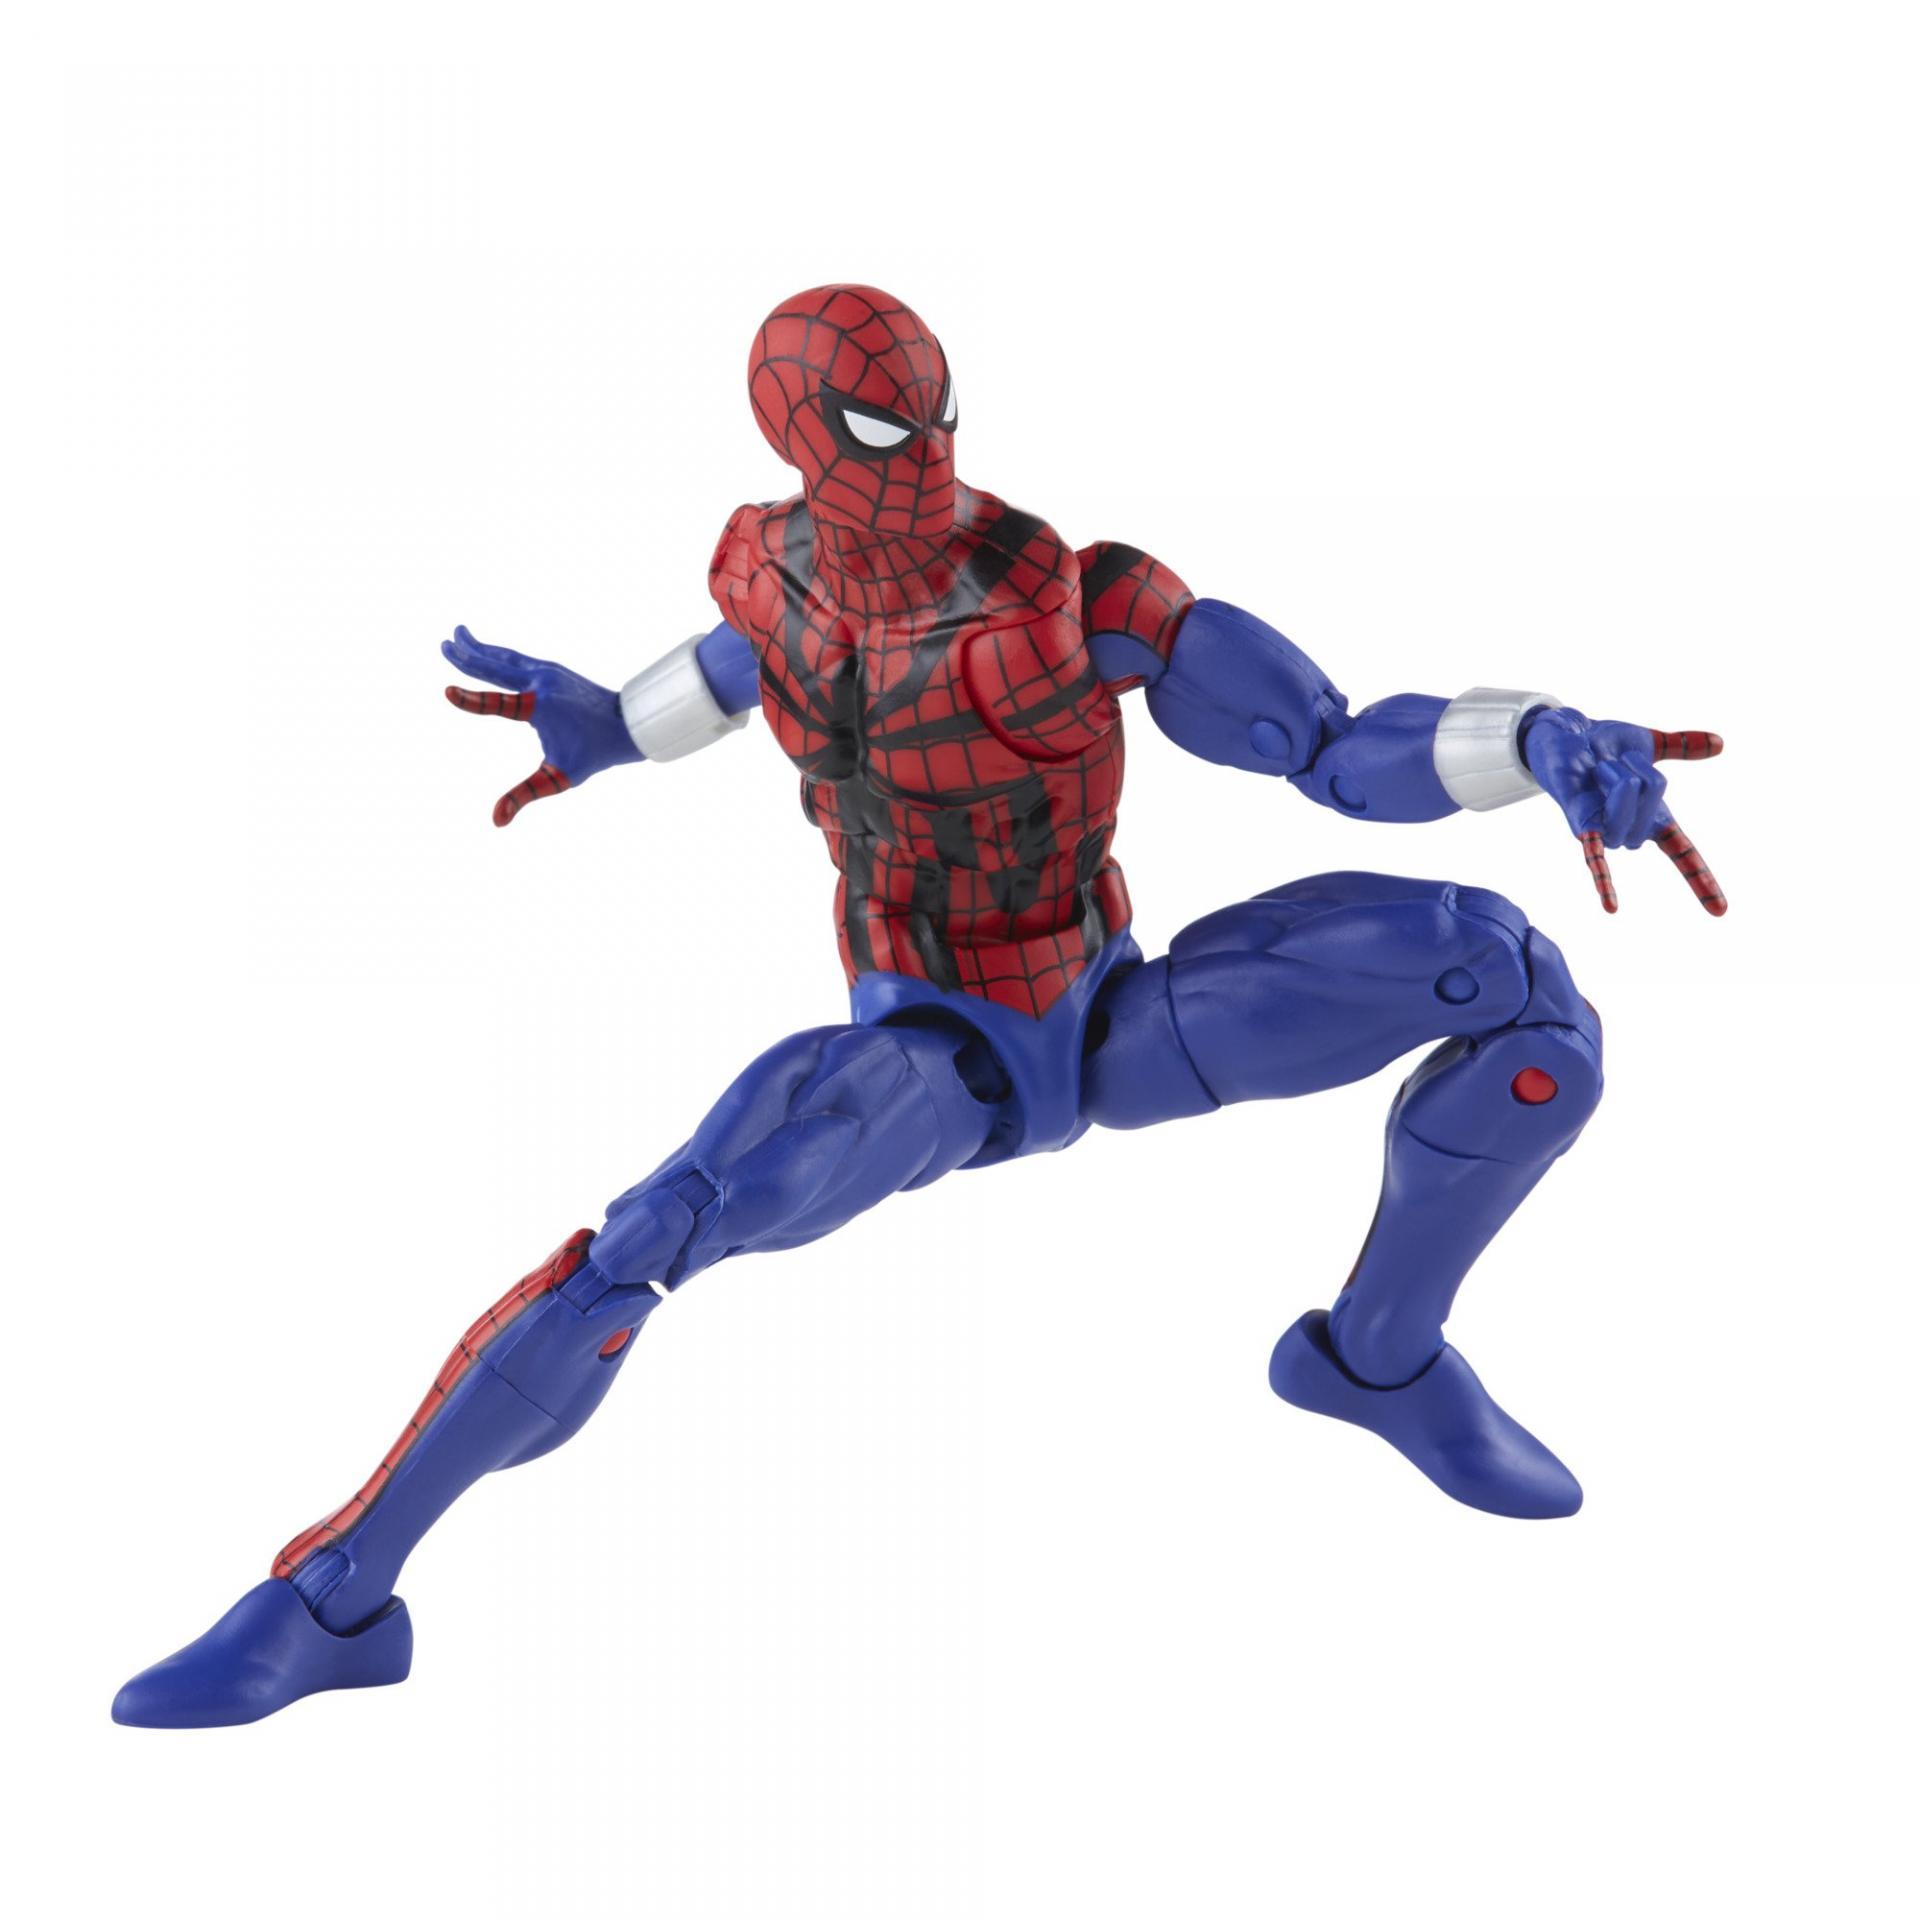 Marvel legends series hasbro spider armor mk i6